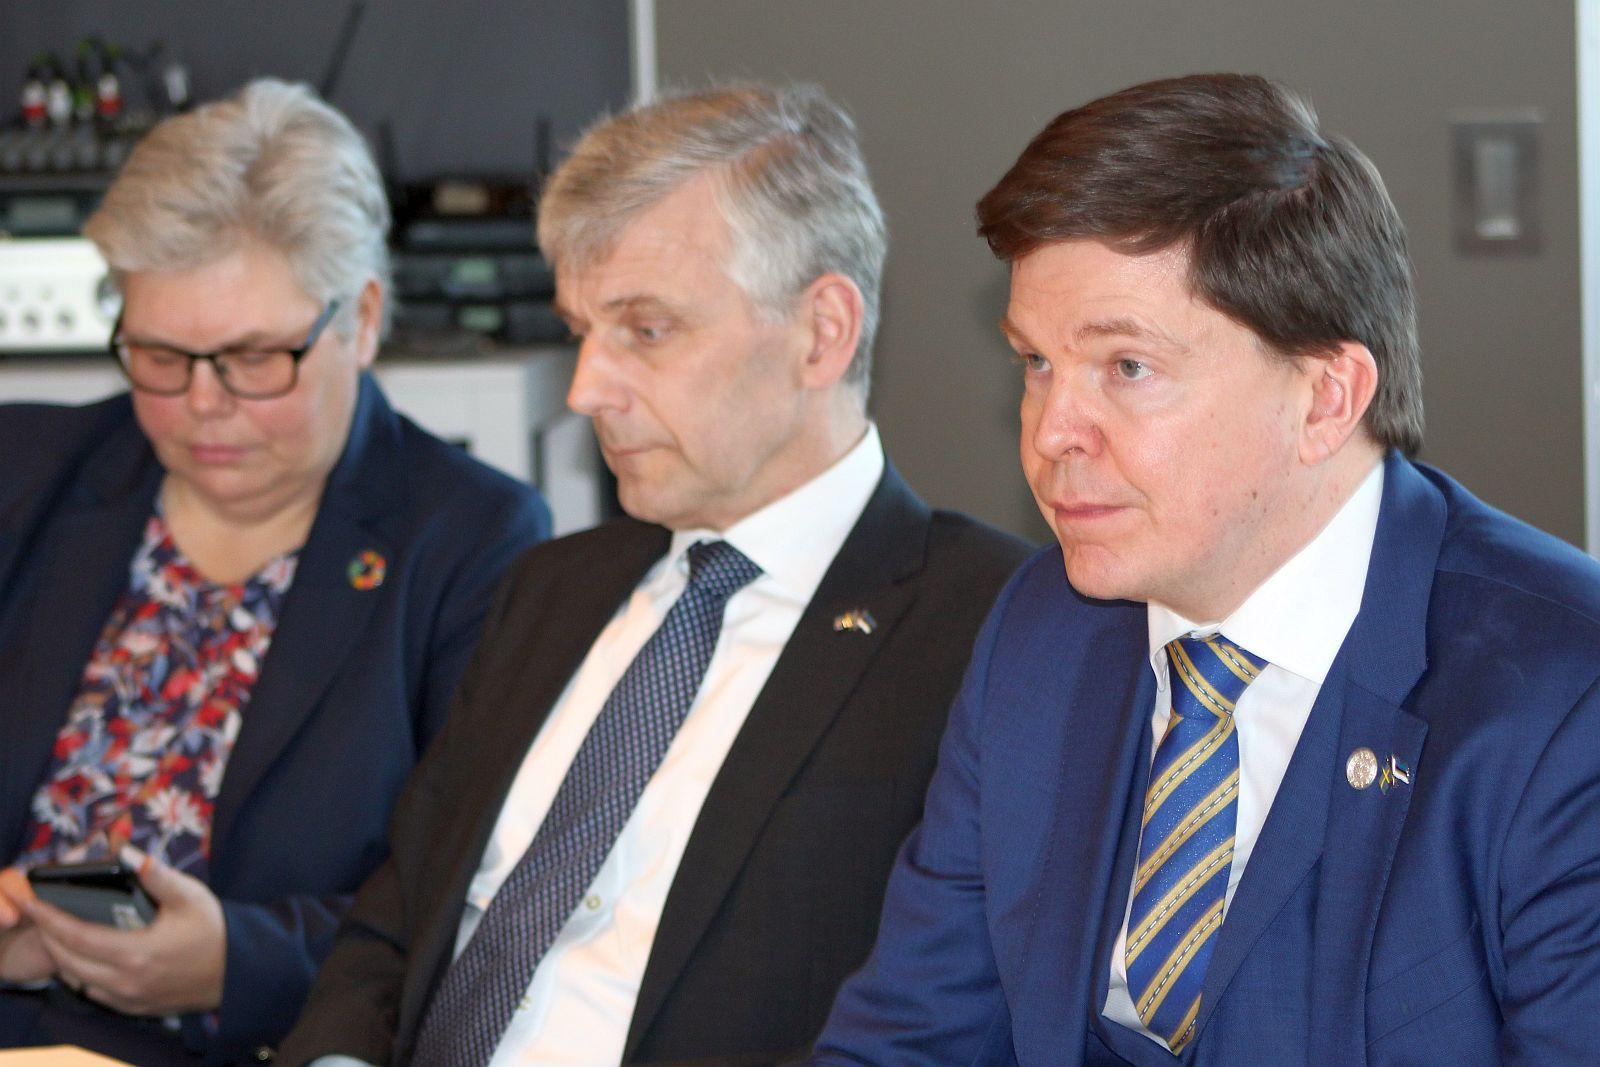 Image for Rootsi parlamendi esimees Andreas Norlén külastas RKK-d